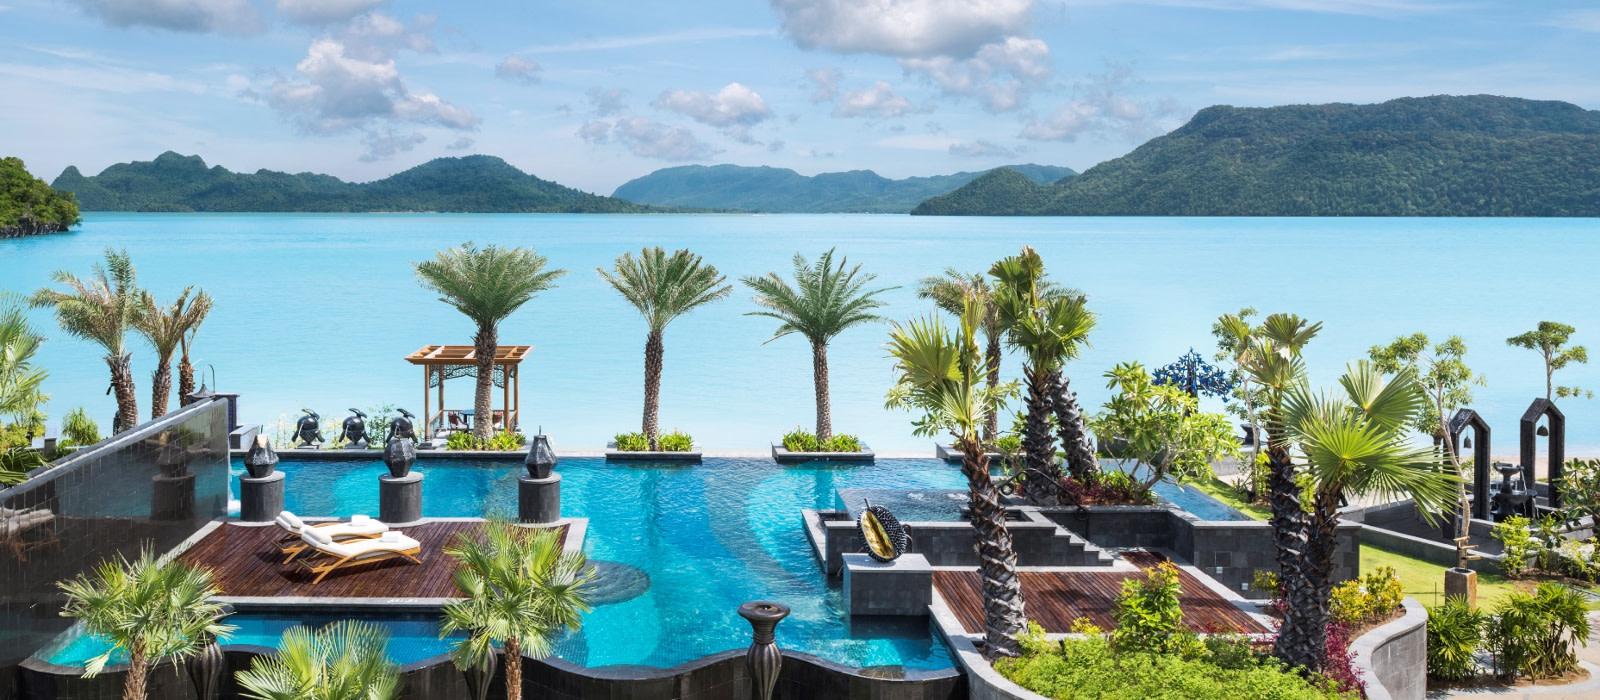 Hotel The St. Regis Malaysia